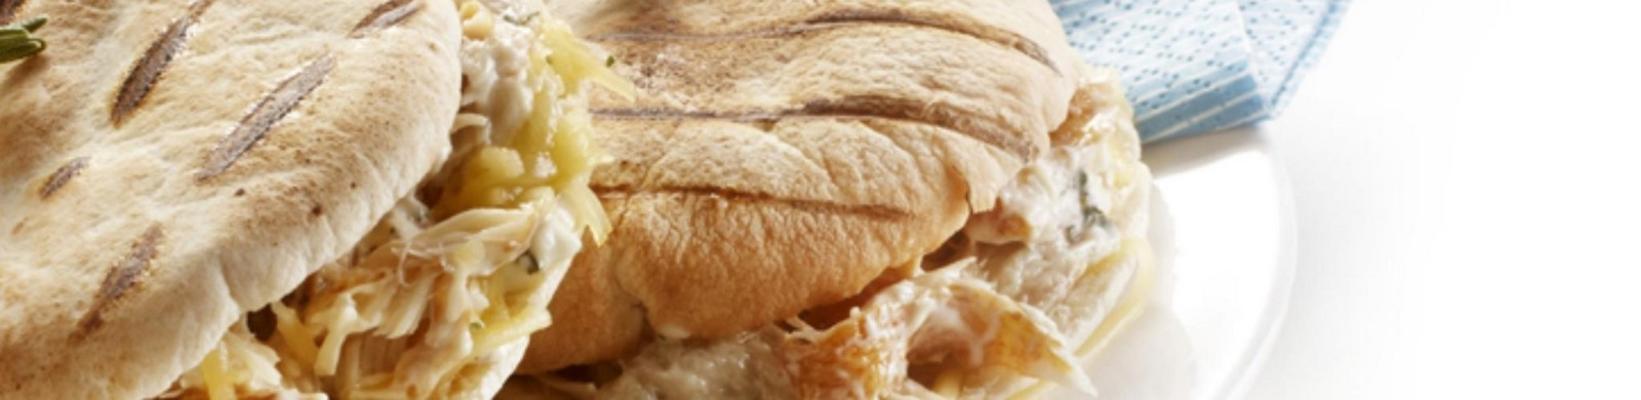 pita sandwich with mackerel